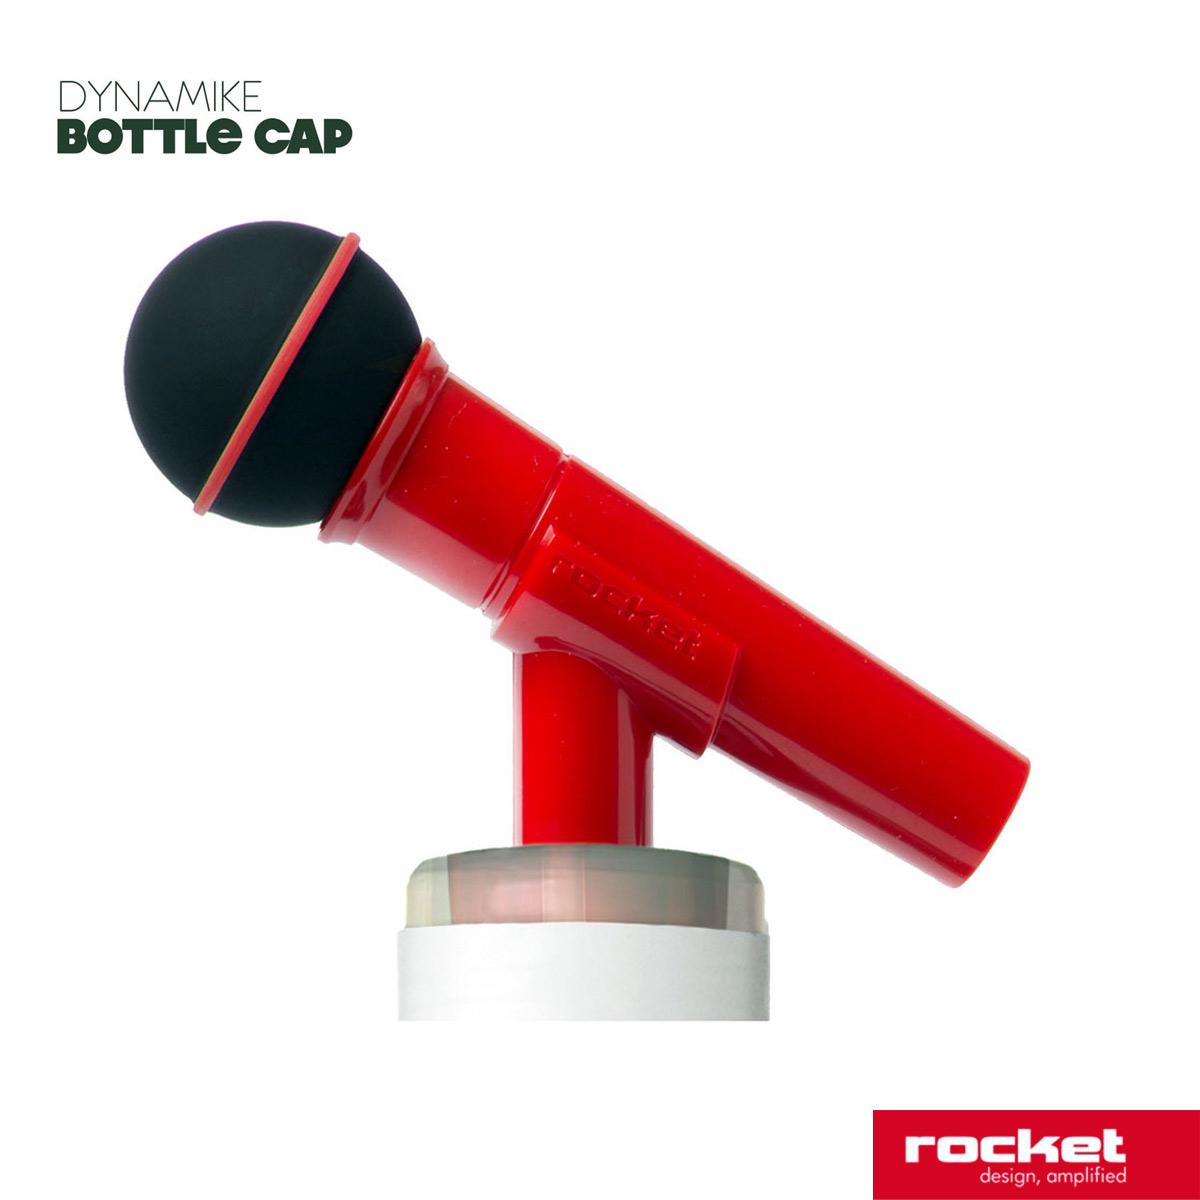 rocket-design-3-dynamike-bottle-cap-red-rosso-tappo-bottiglia ...